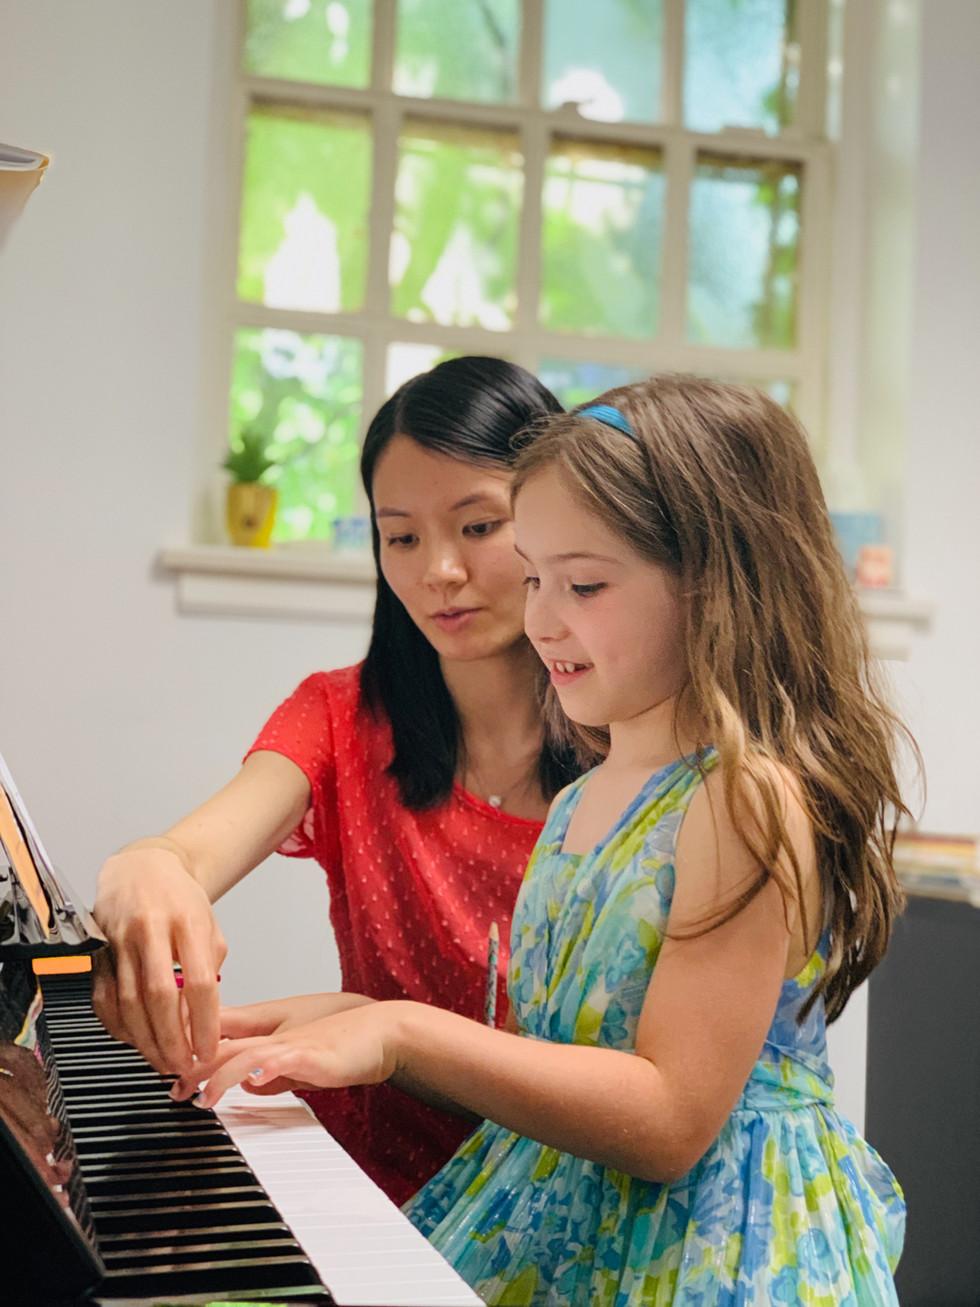 Piano Lessons in Forest Glen IL